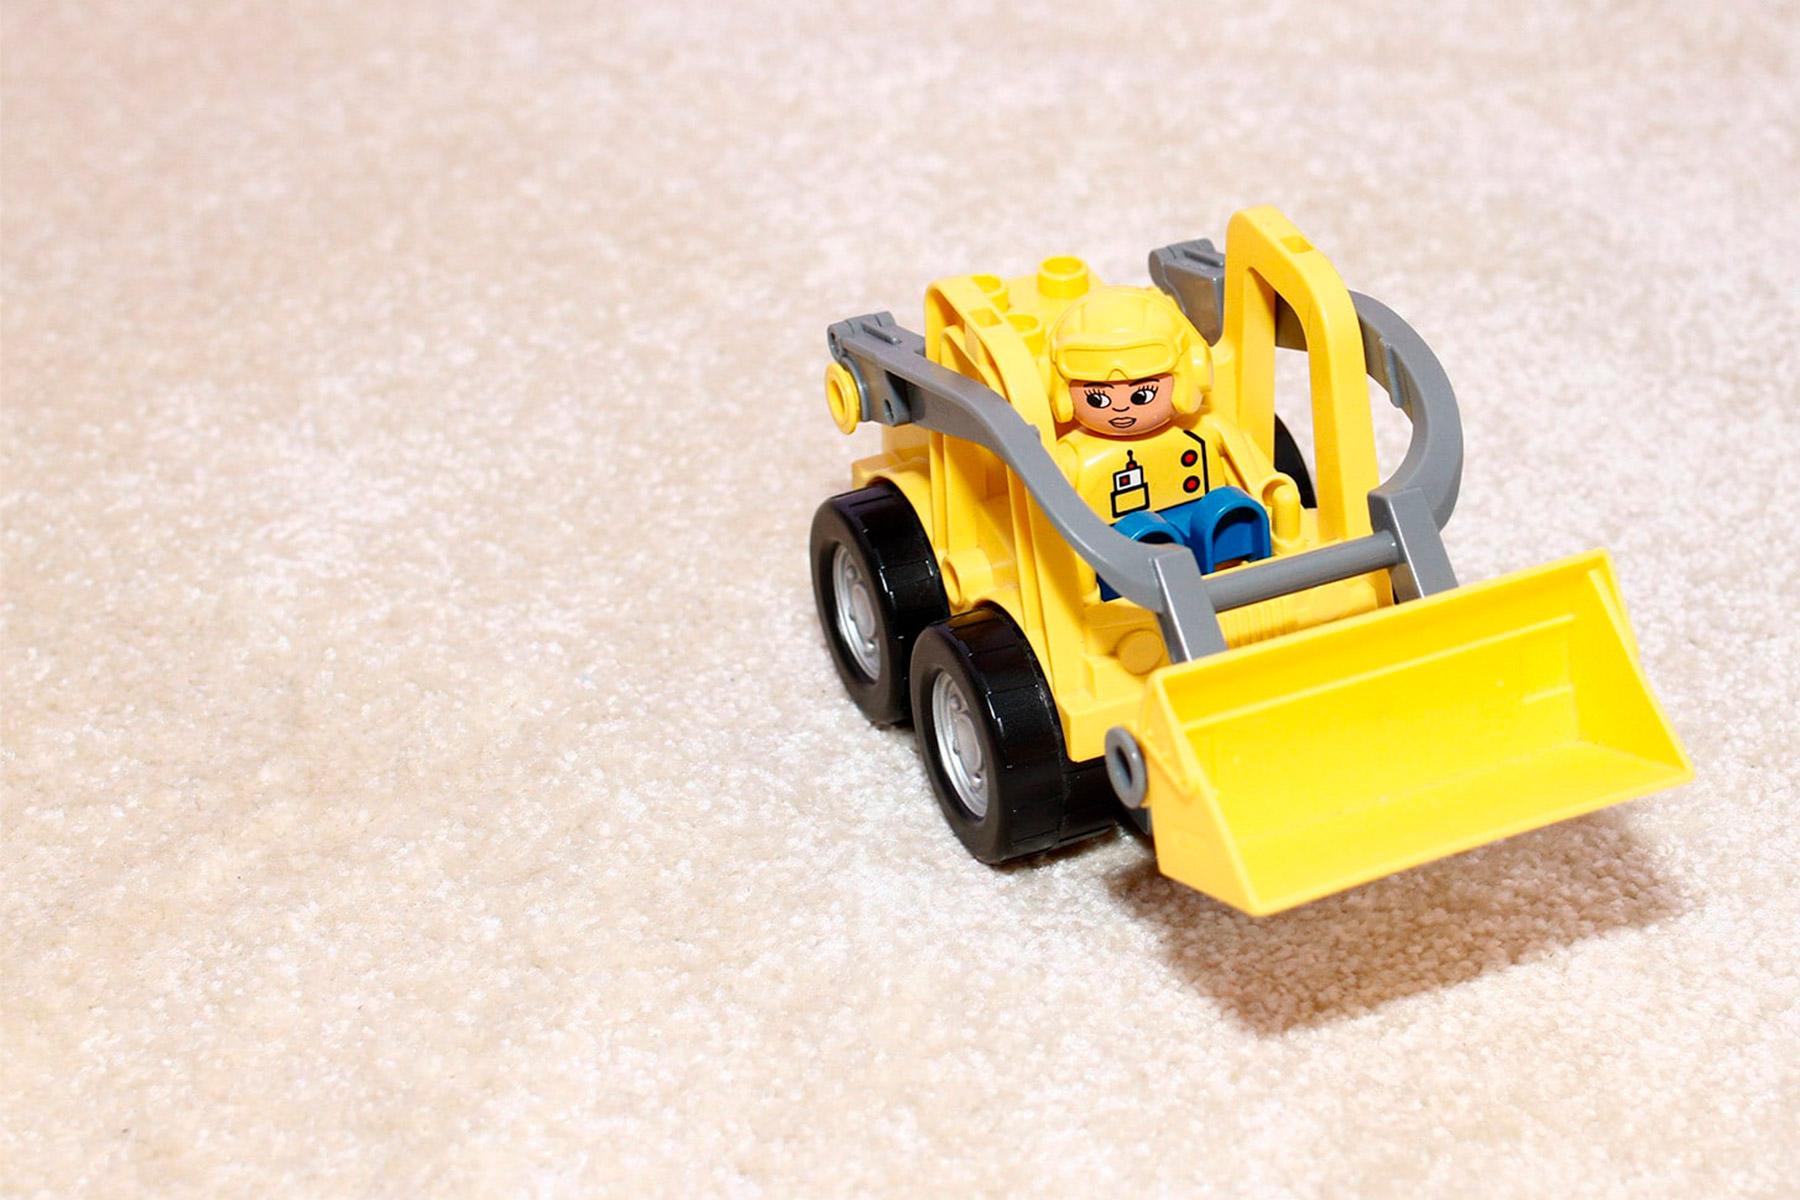 Lego Duplo Radlader